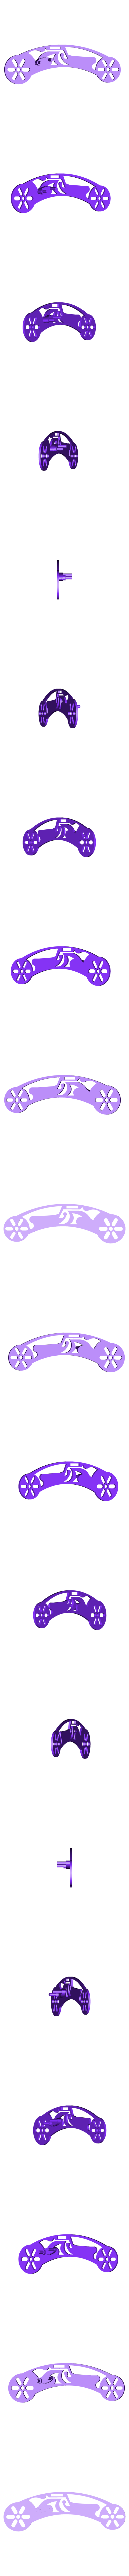 DC Left Side.stl Download free STL file AUG 2018 UFO Project, Drift Motorcycle • 3D printer template, Alien3d